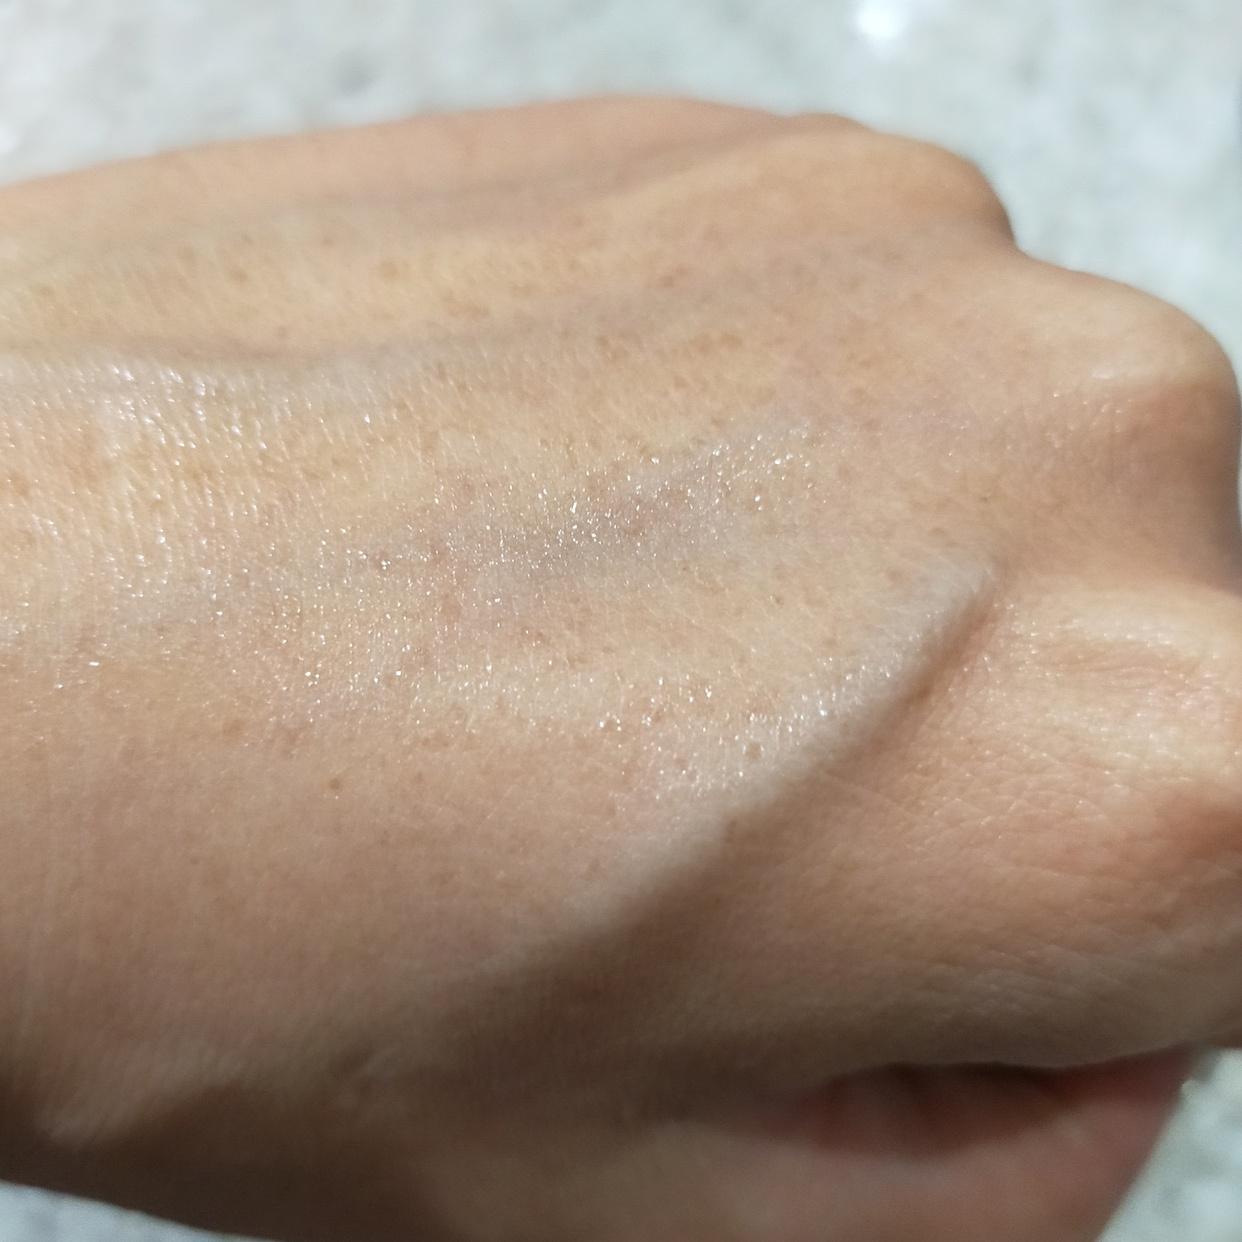 ALLNA ORGANIC(オルナ オーガニック)拭き取り化粧水を使ったみこさんのクチコミ画像5